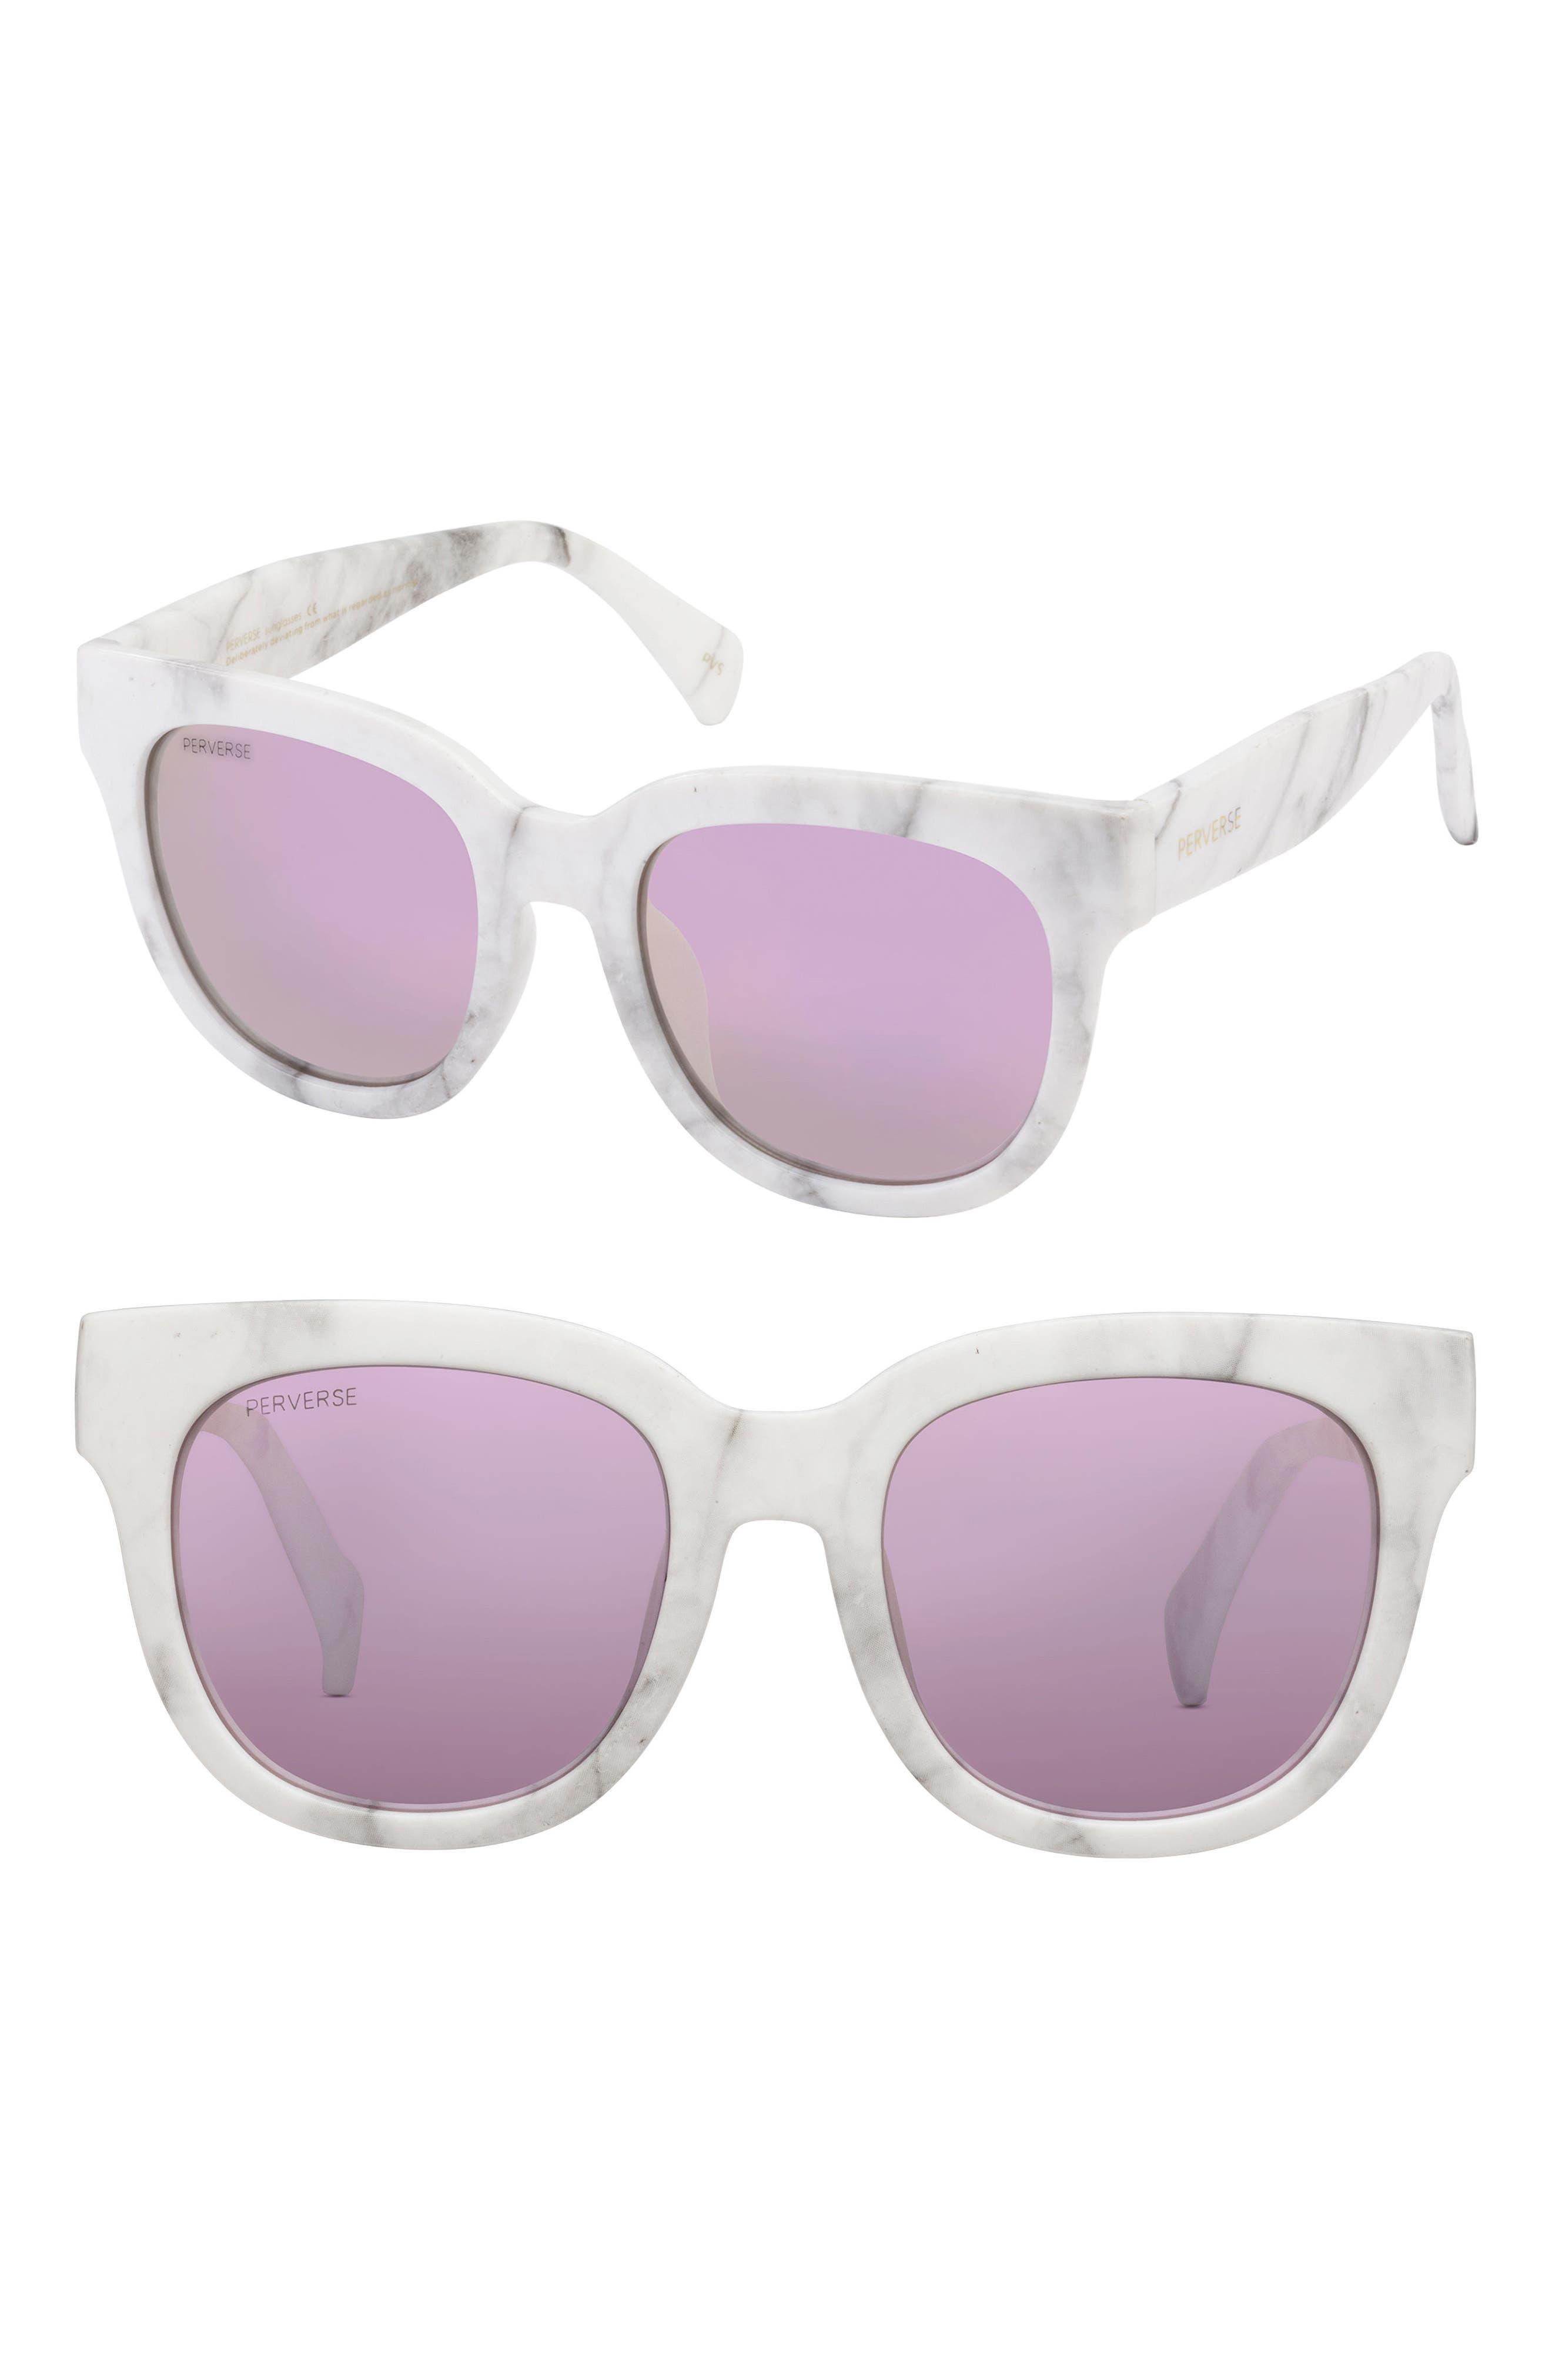 Roman 50mm Mirrored Sunglasses,                         Main,                         color, White/ Grey/ Pink